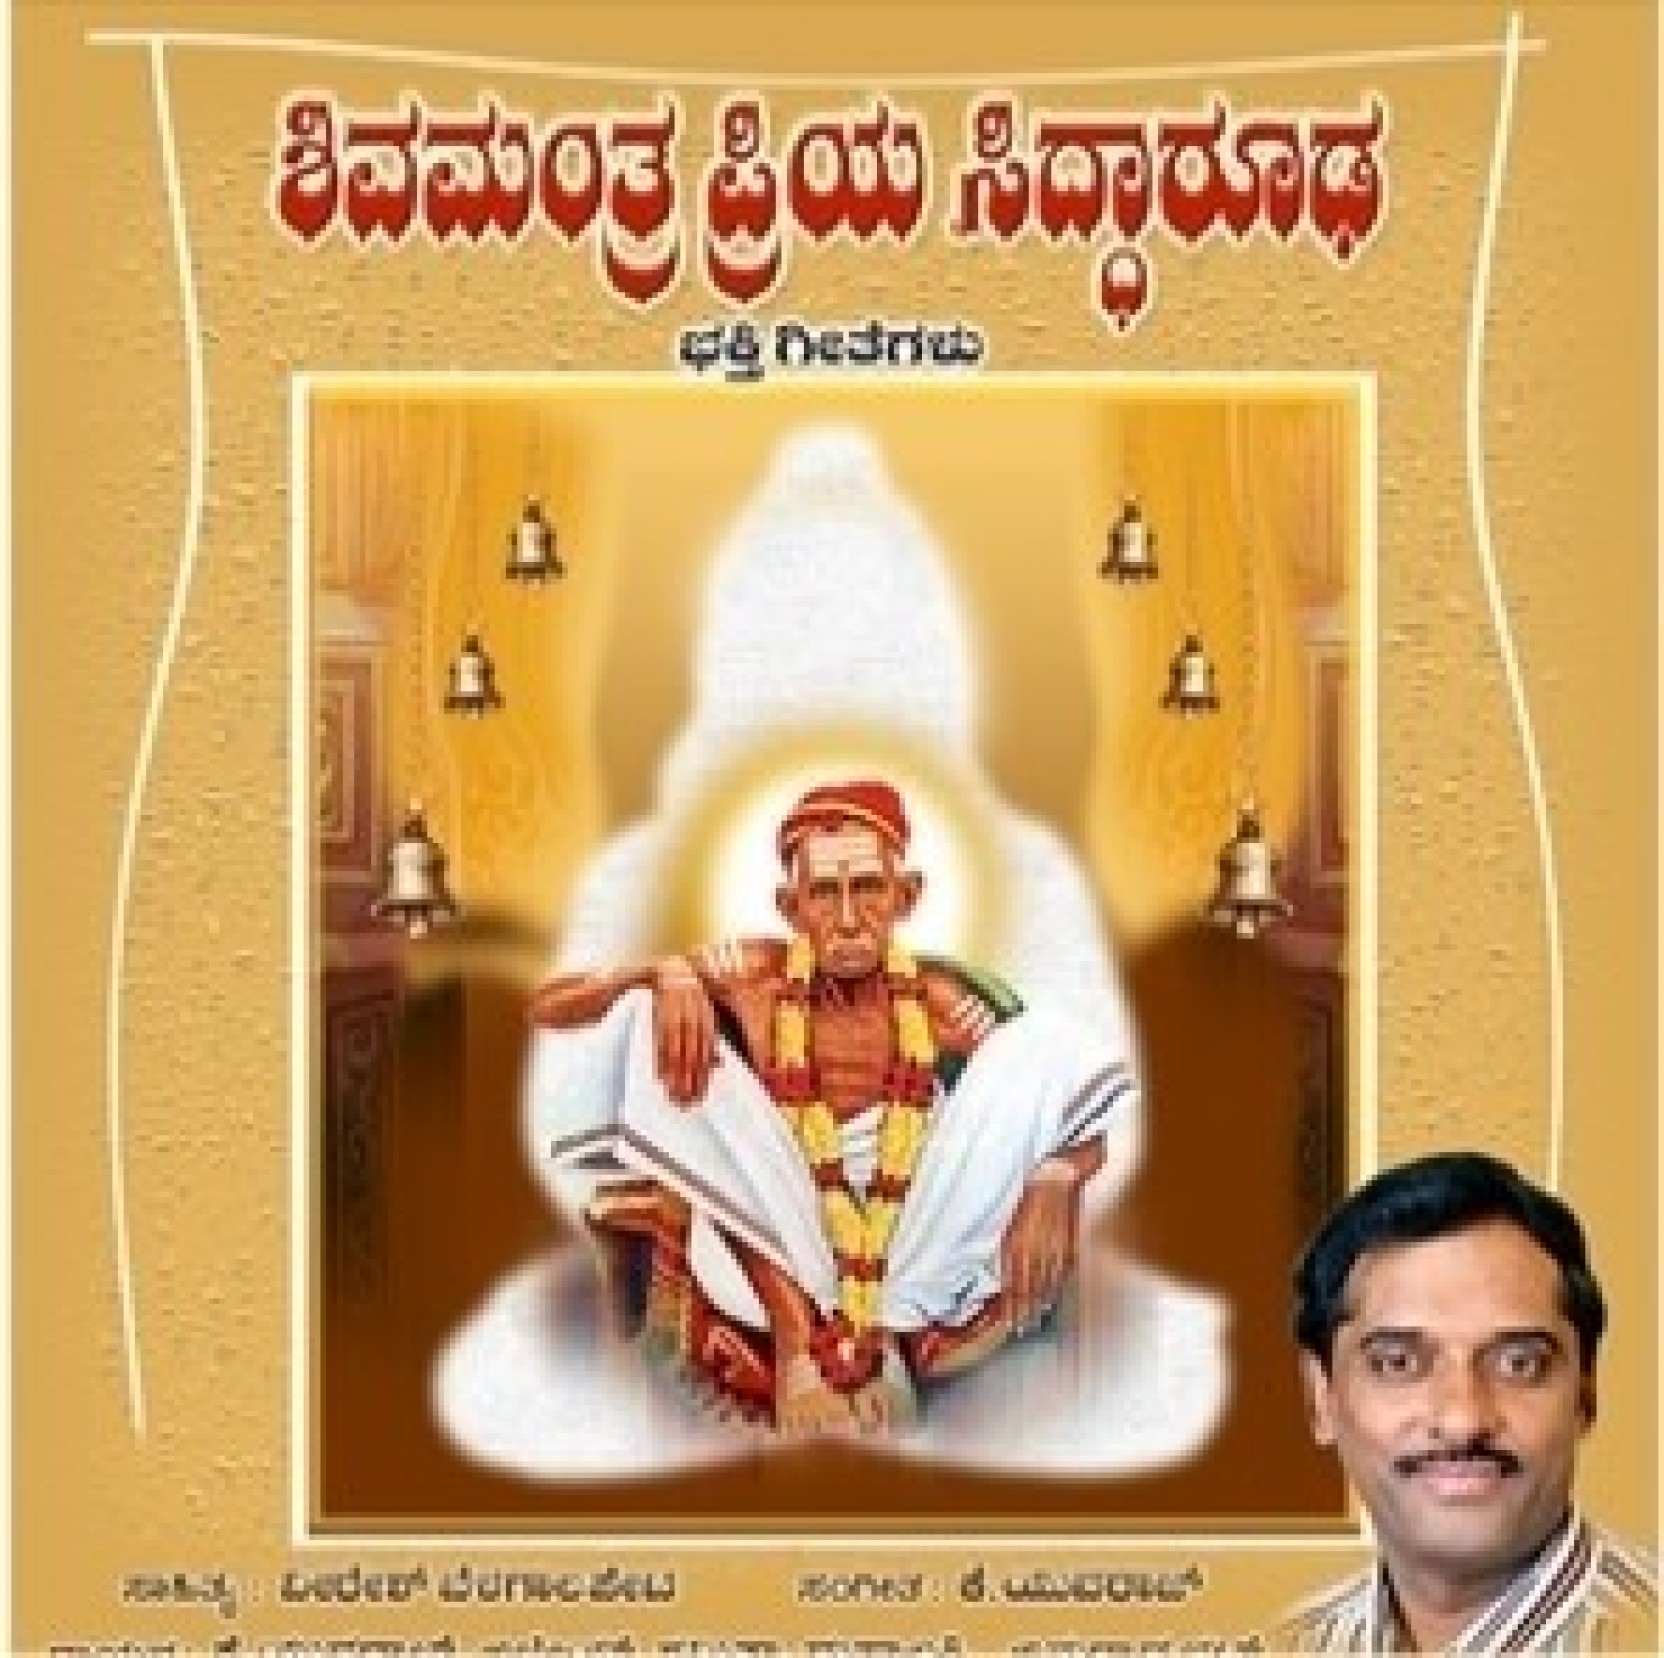 St Shiva Mantra Audio – Grcija